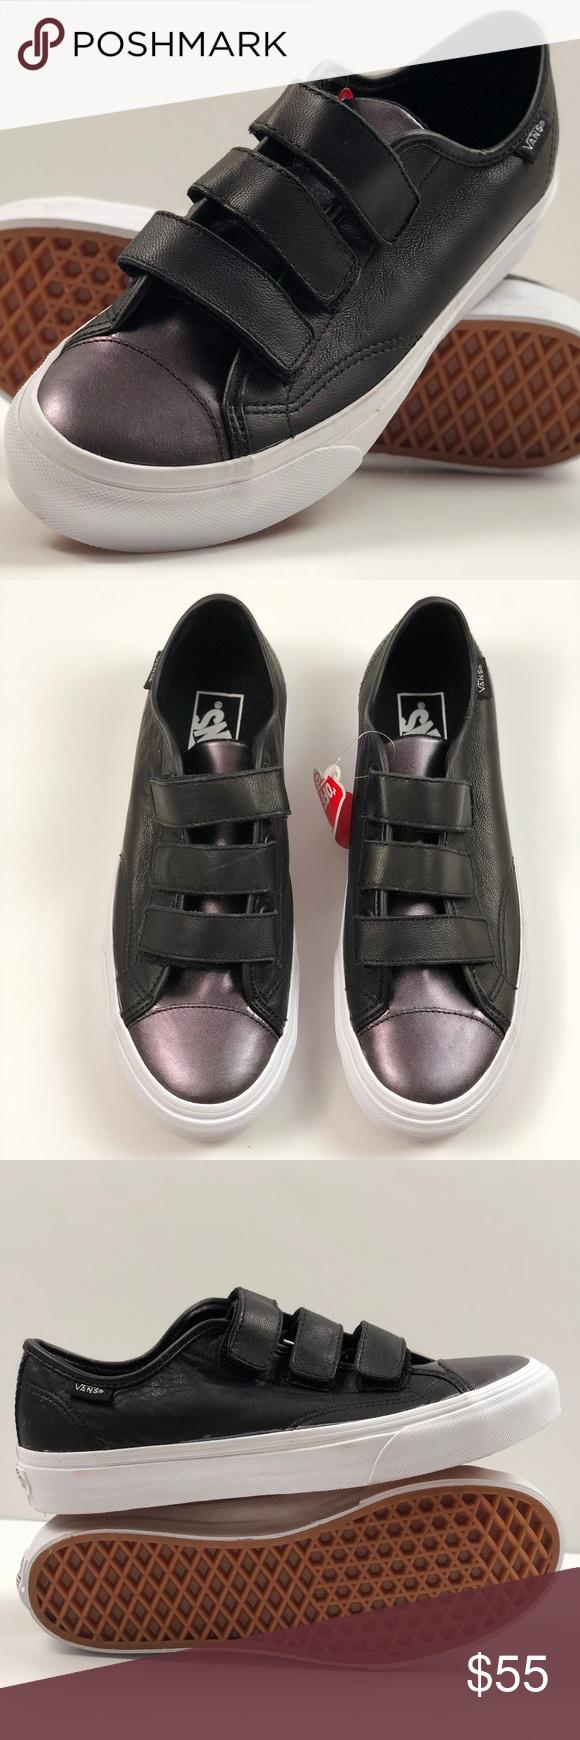 Vans 2 Tone Leather Style 23 V Gunmetal Black. Vans 2 Tone Leather Style 23  V Gunmetal Black. Condition  New with box. Size  Women s 8 f1fb927e6